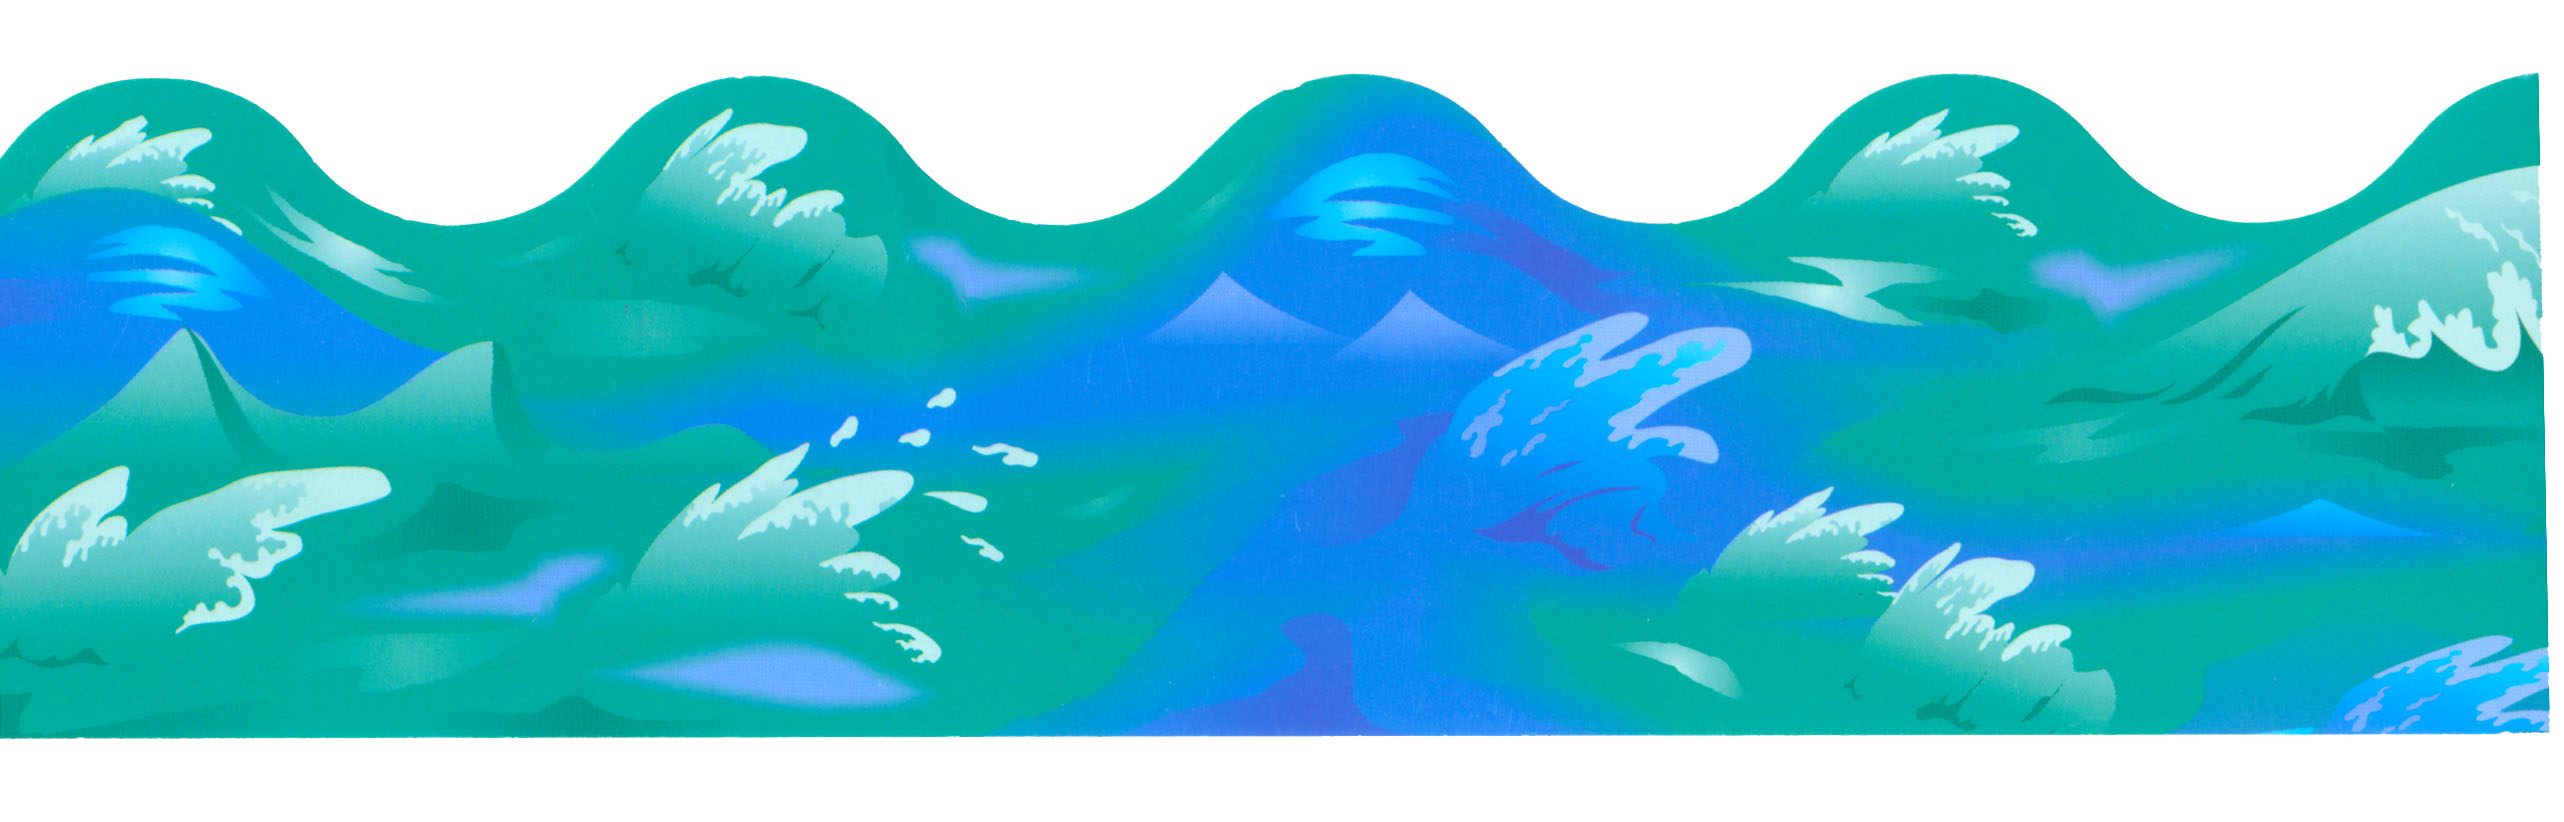 Cartoon Waves Clip Art